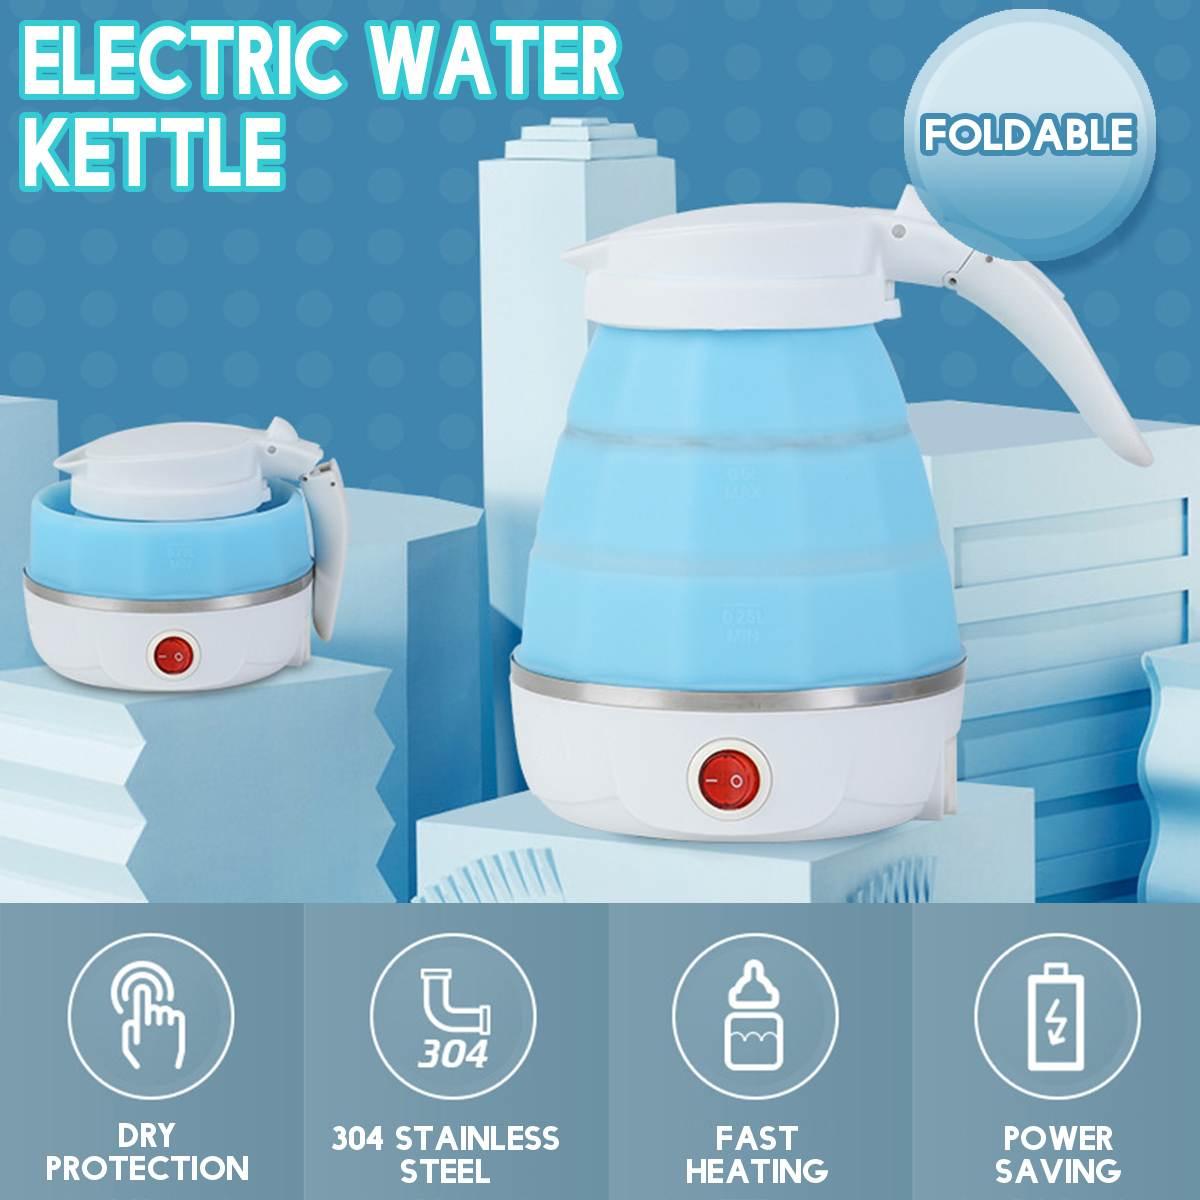 0.6L elektrikli su ısıtıcısı emniyet silikon katlanabilir taşınabilir seyahat kamp su kazanı ısıtıcı 220V 700W Mini ev elektrikli cihaz